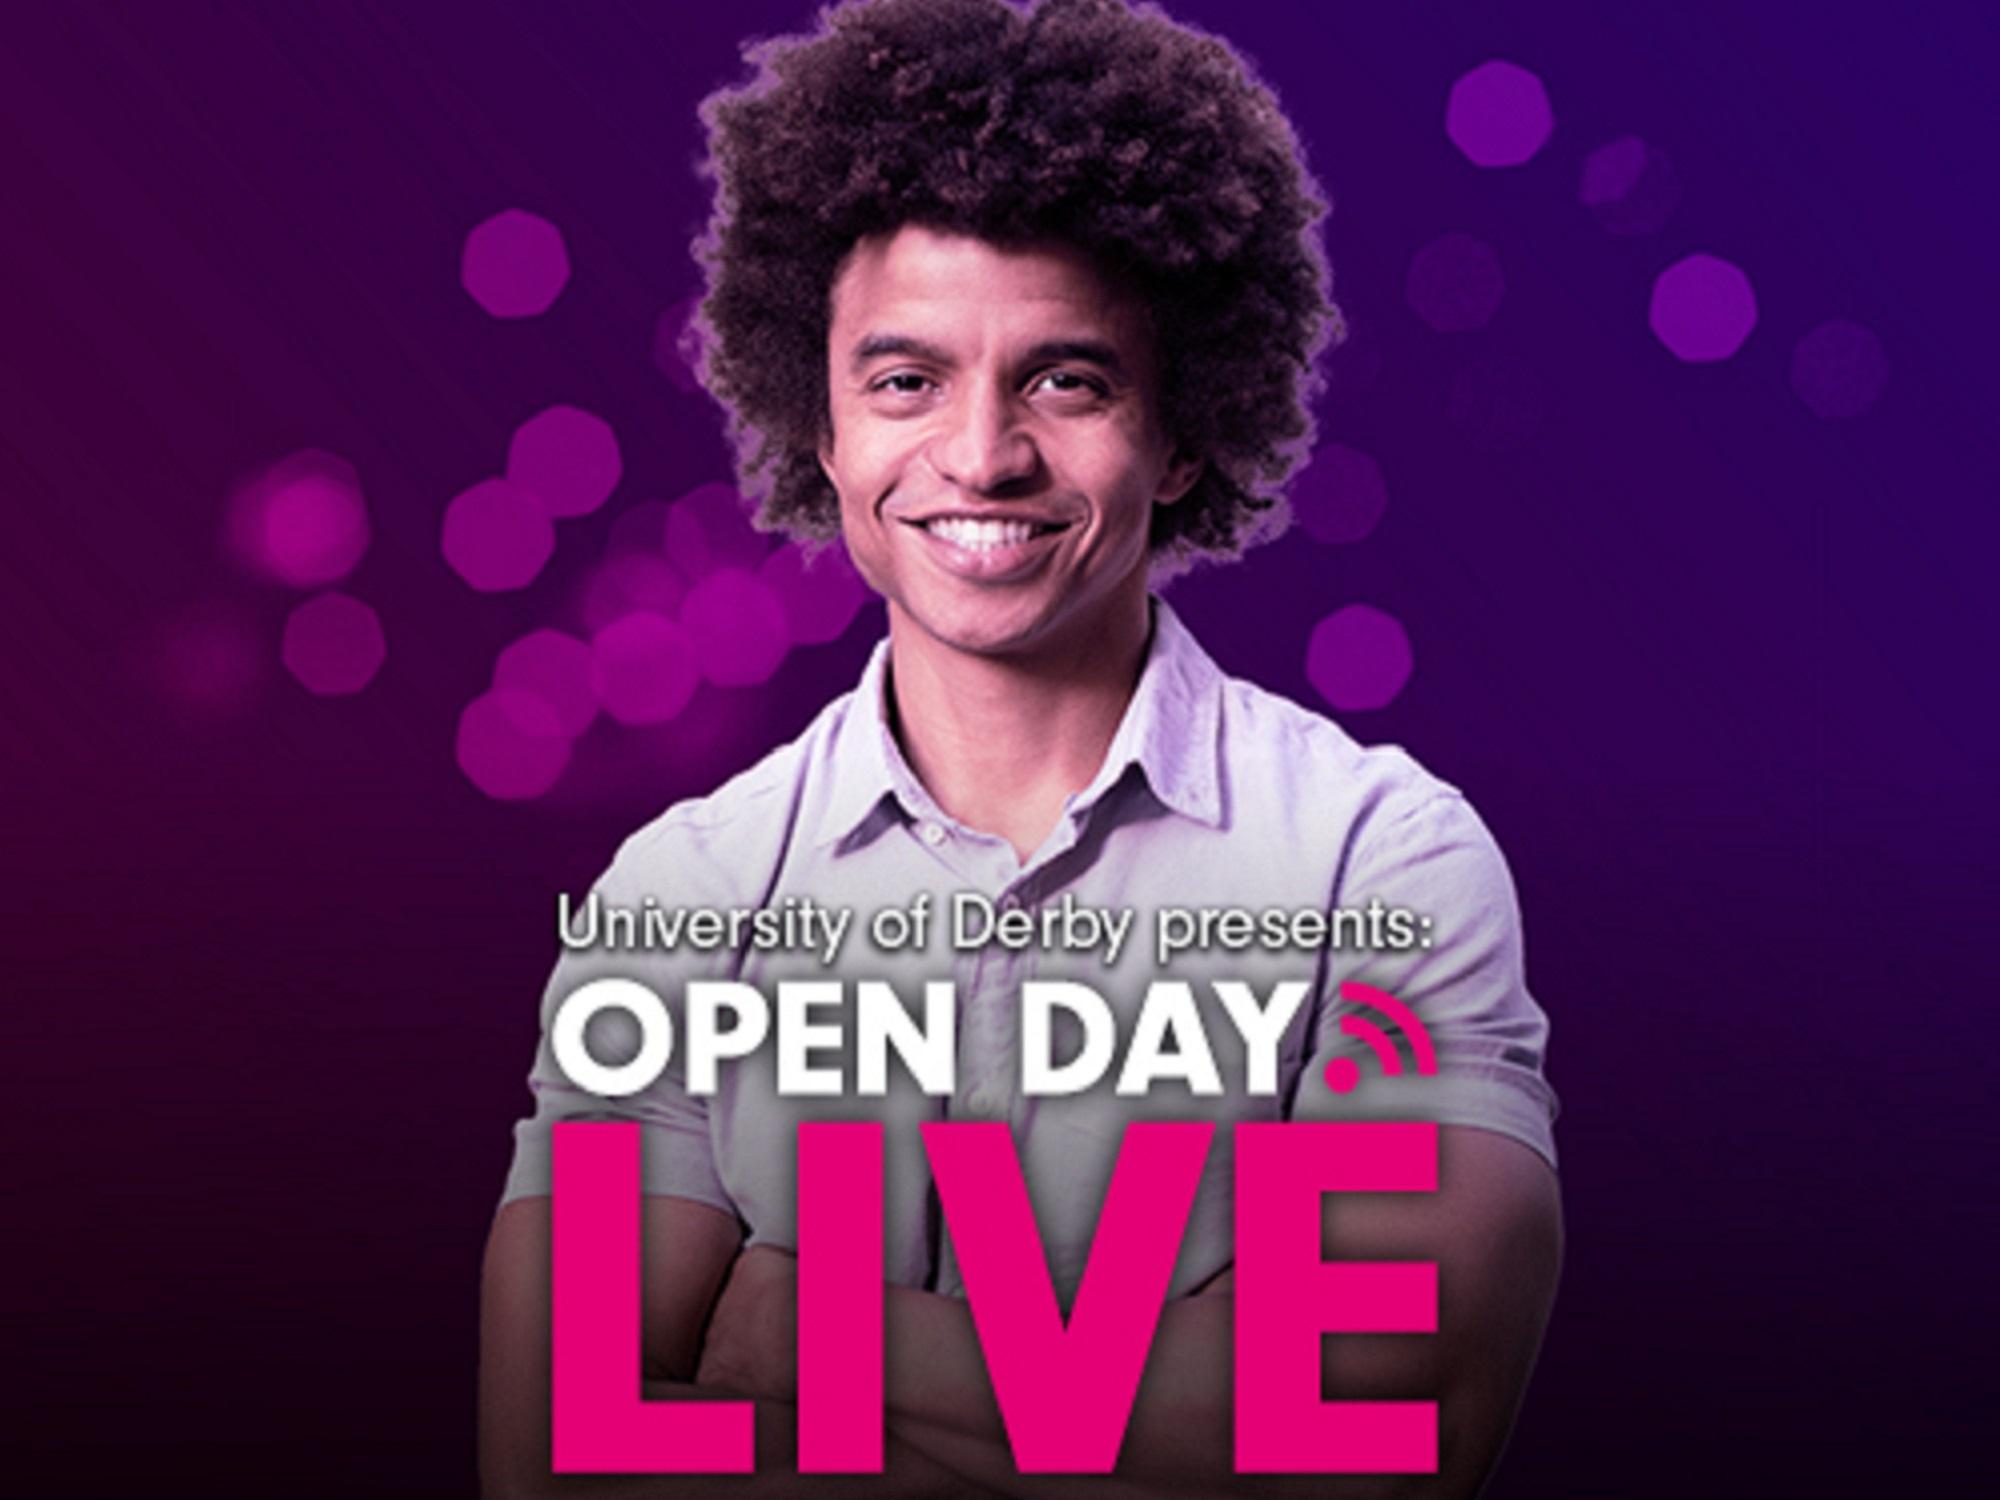 TV presenter Radzi Chinyanganya previews The University of Derby Presents...Open Day Live